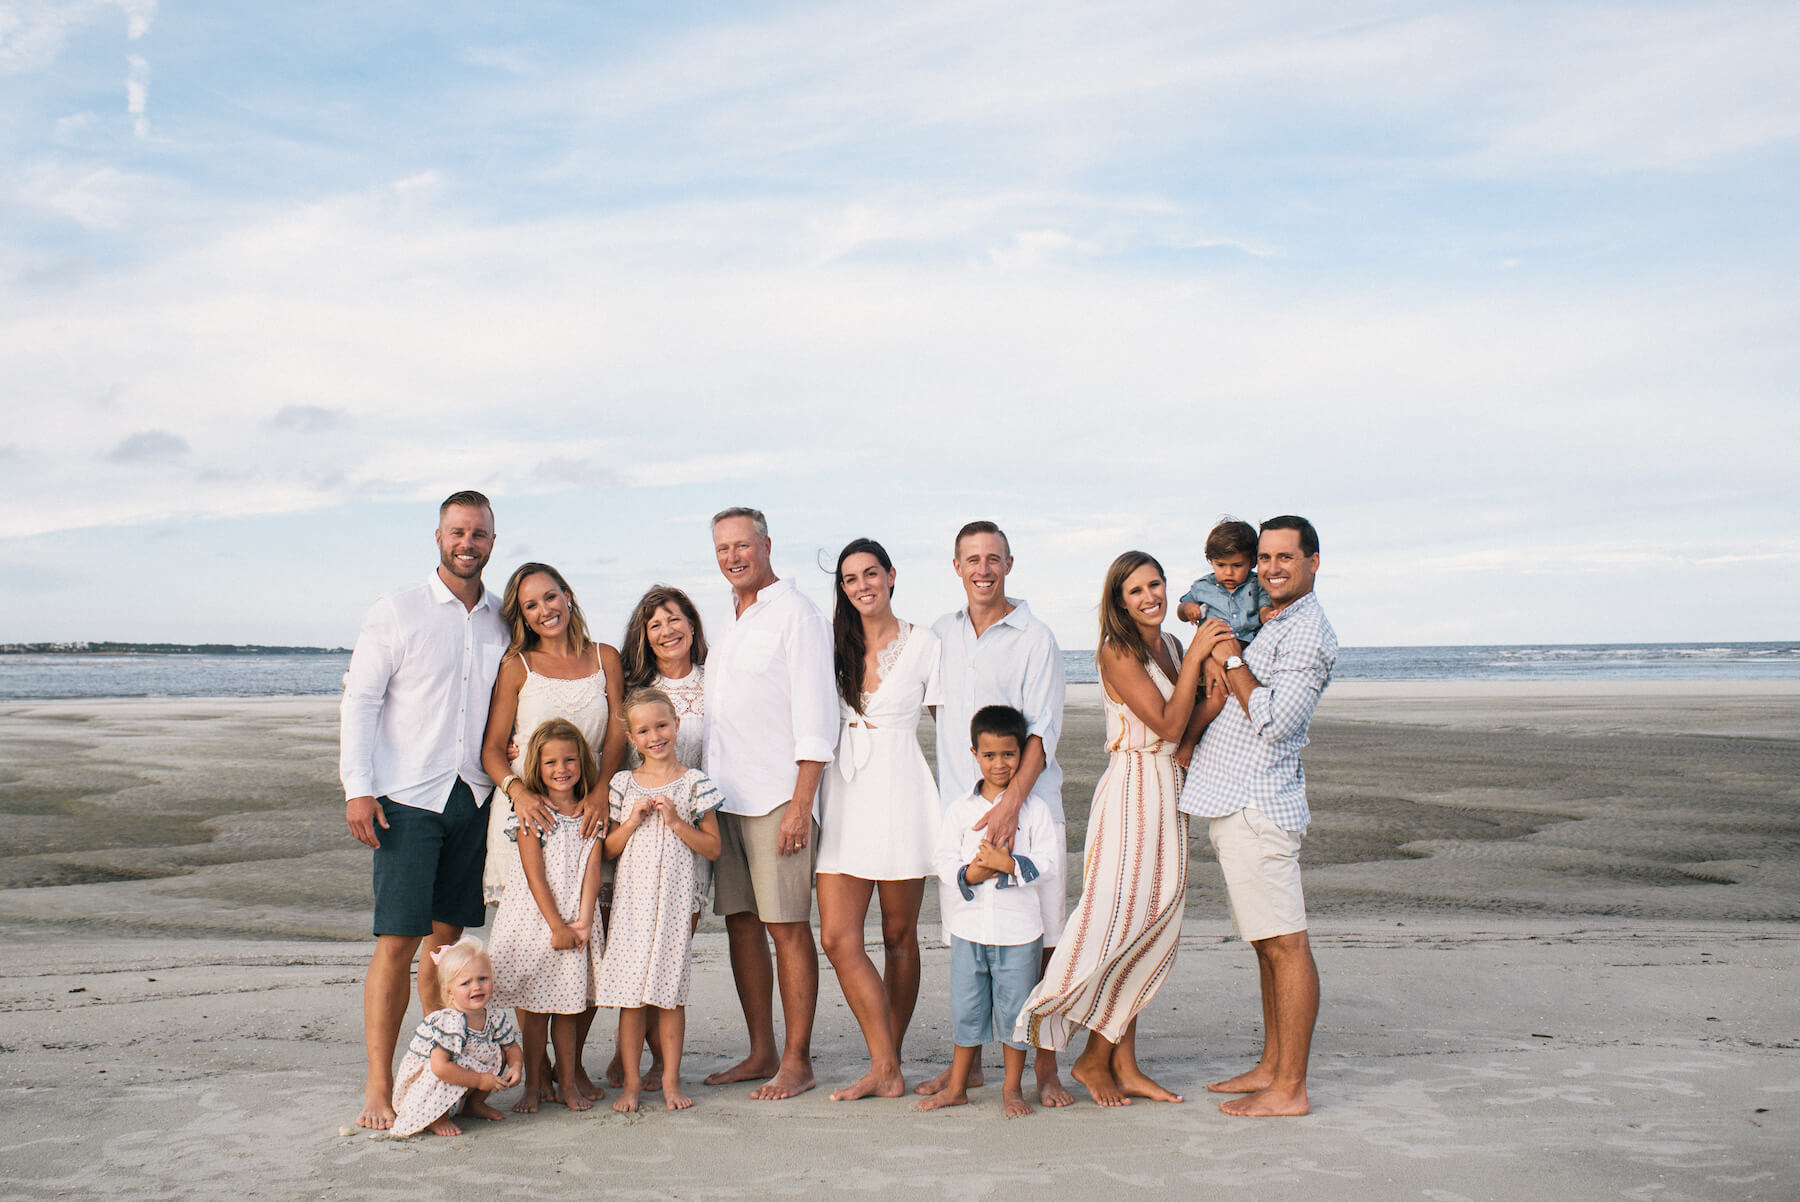 a multigenerational family standing on the beach Savannah, Georgia, United States of America